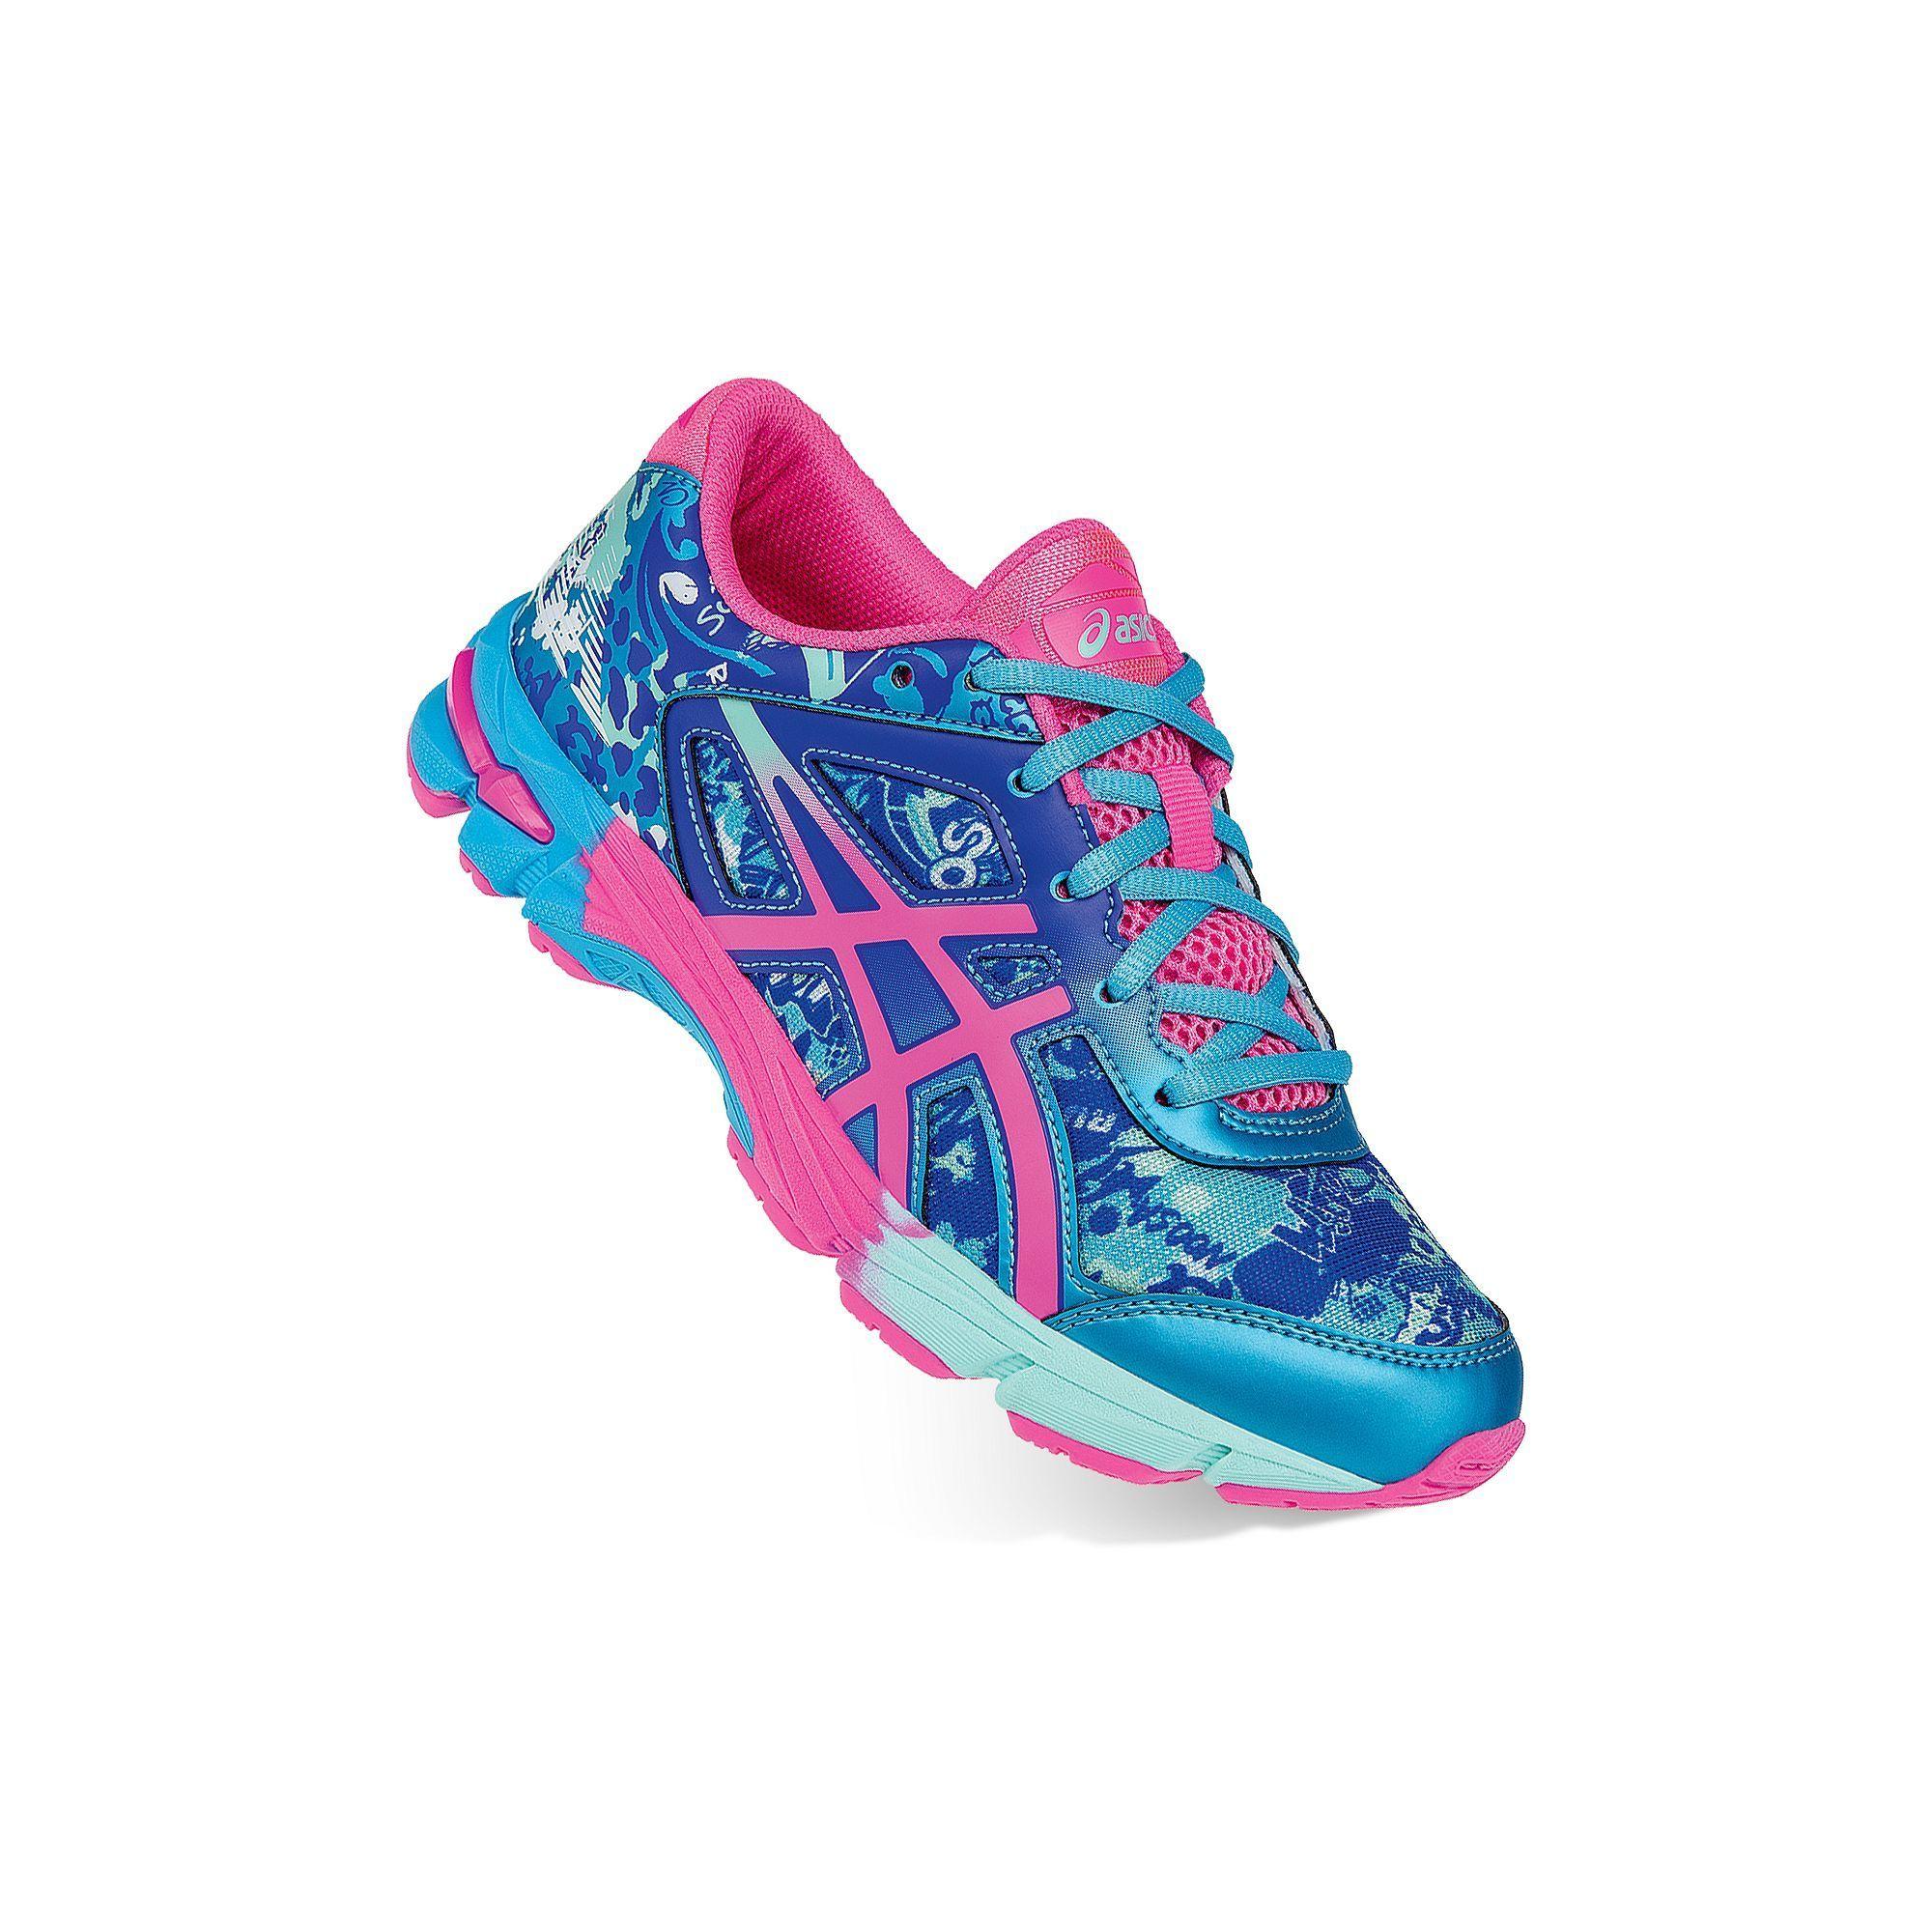 ASICS GEL Noosa TRI 11 Grade School Girls' Running Shoes